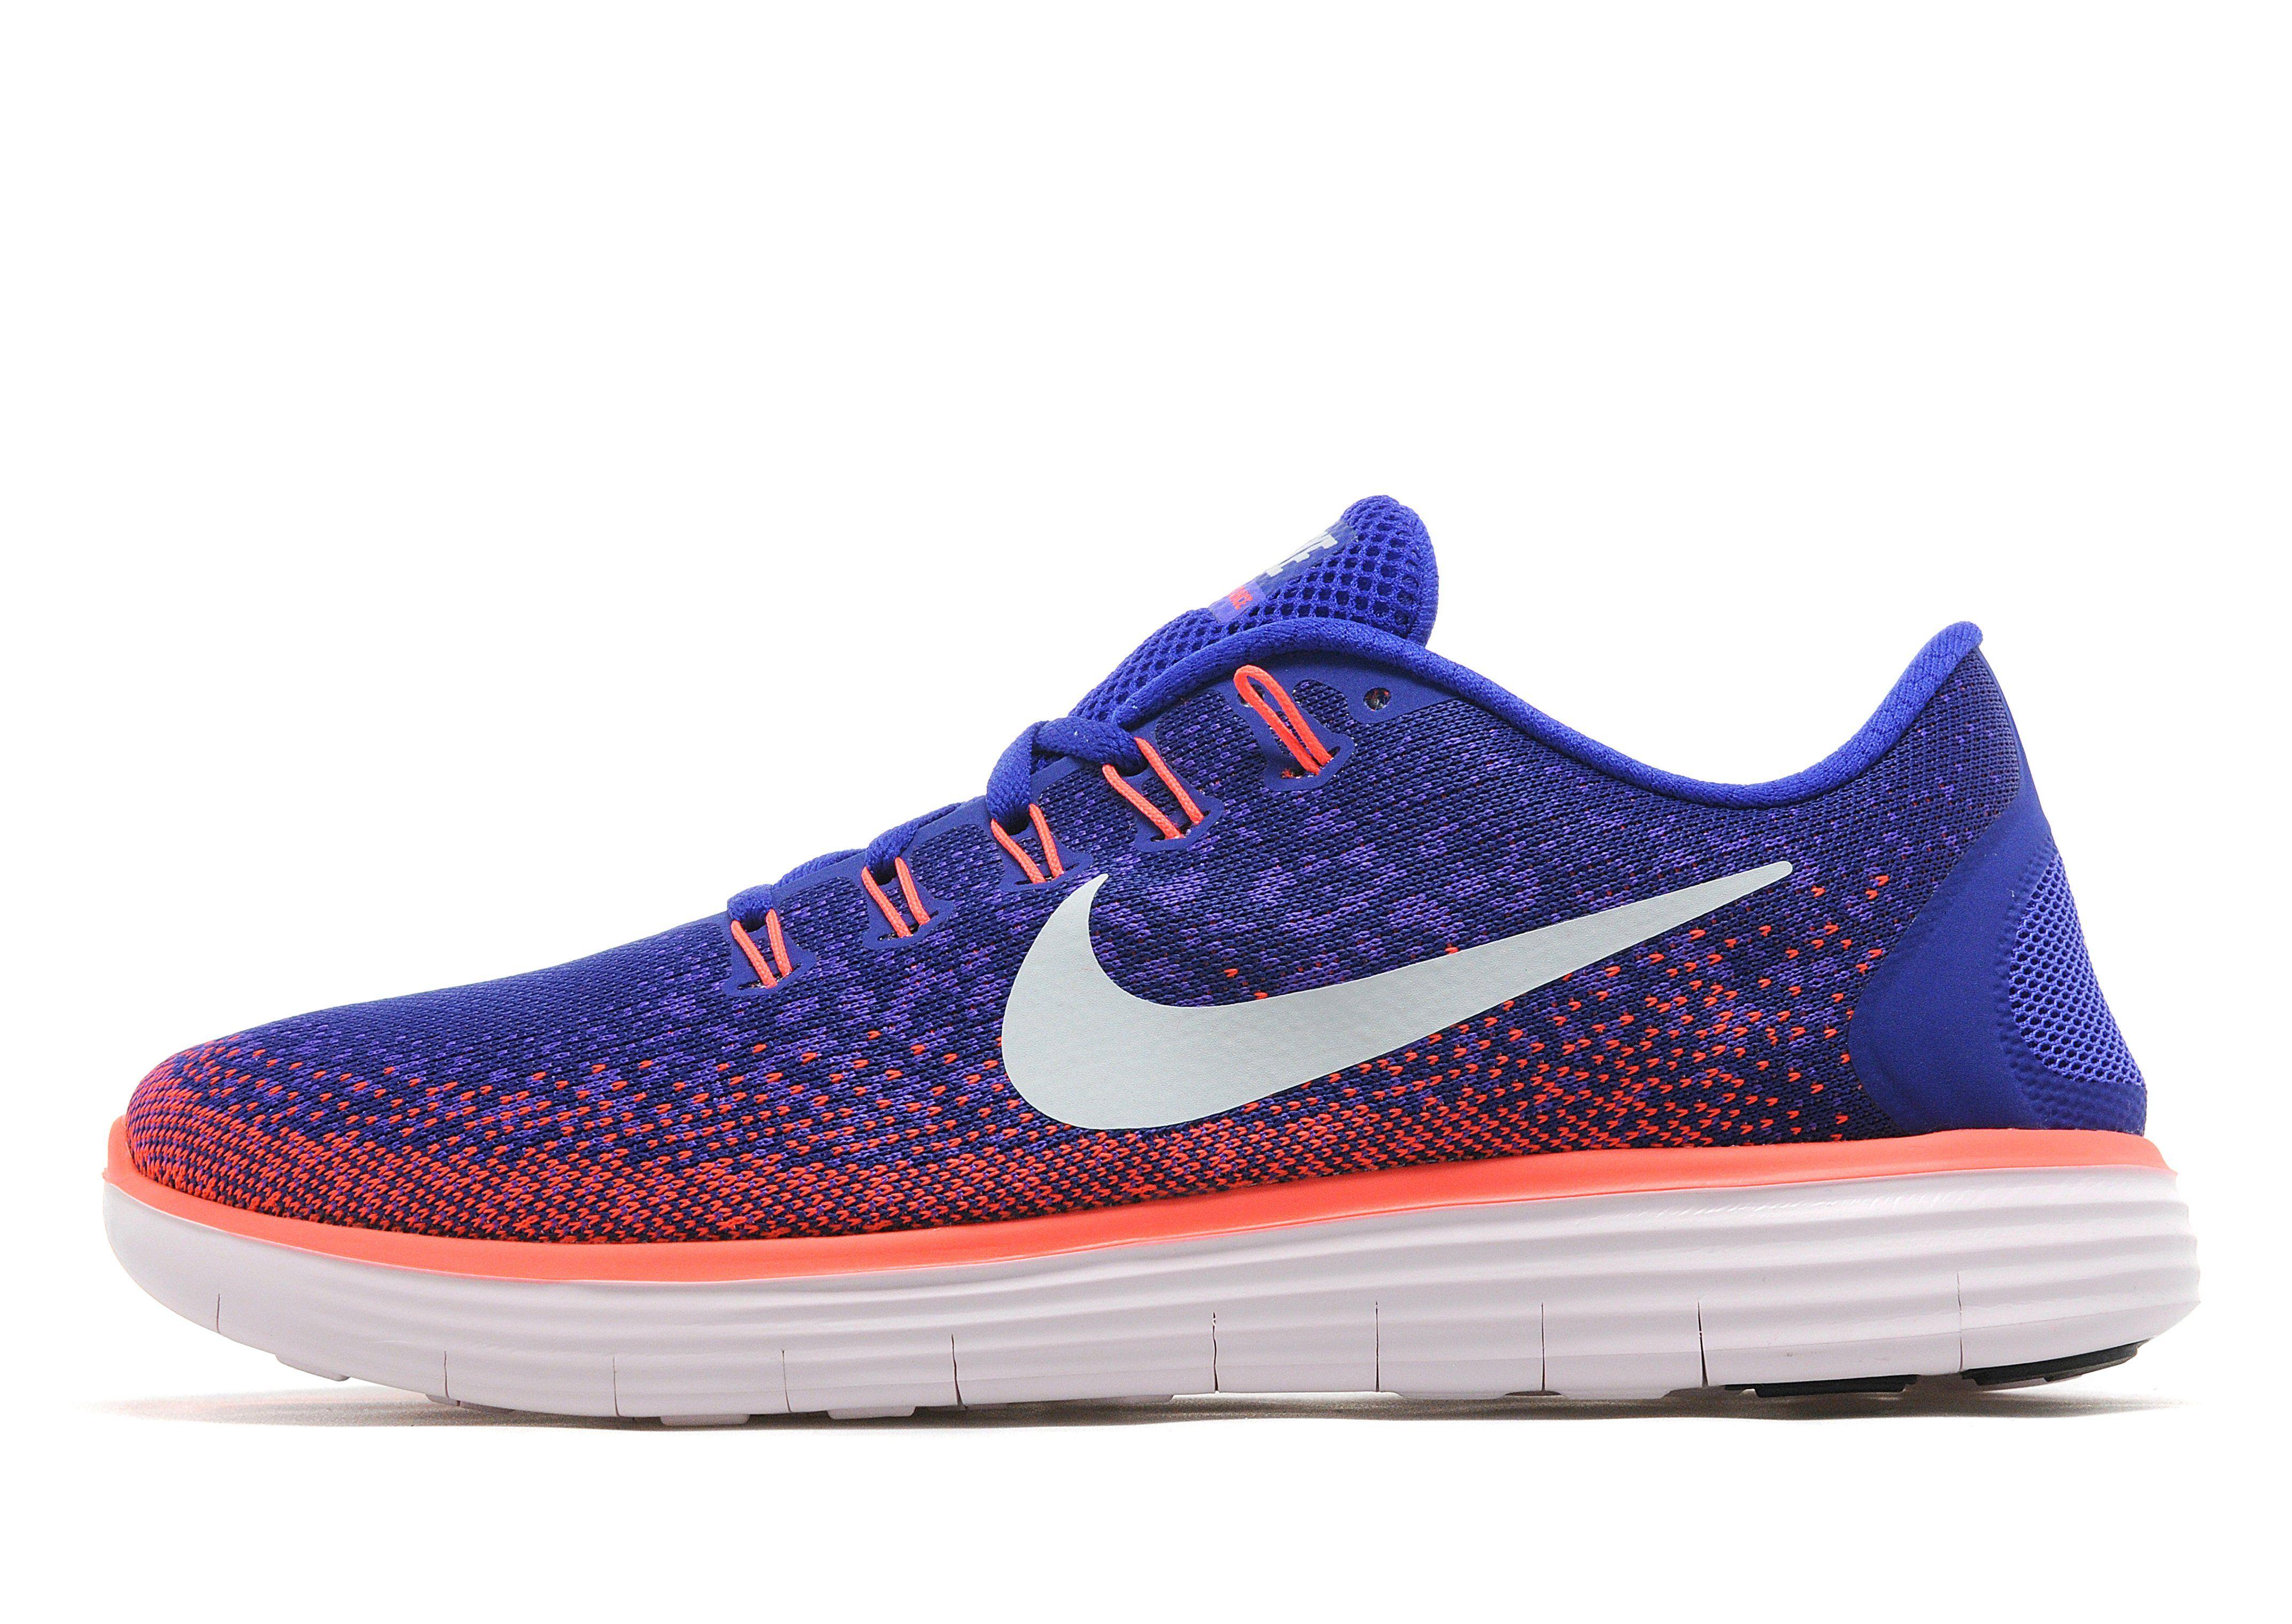 reputable site bebc4 17dde ... Jd Sports Nike Free Run 2 Womens ...